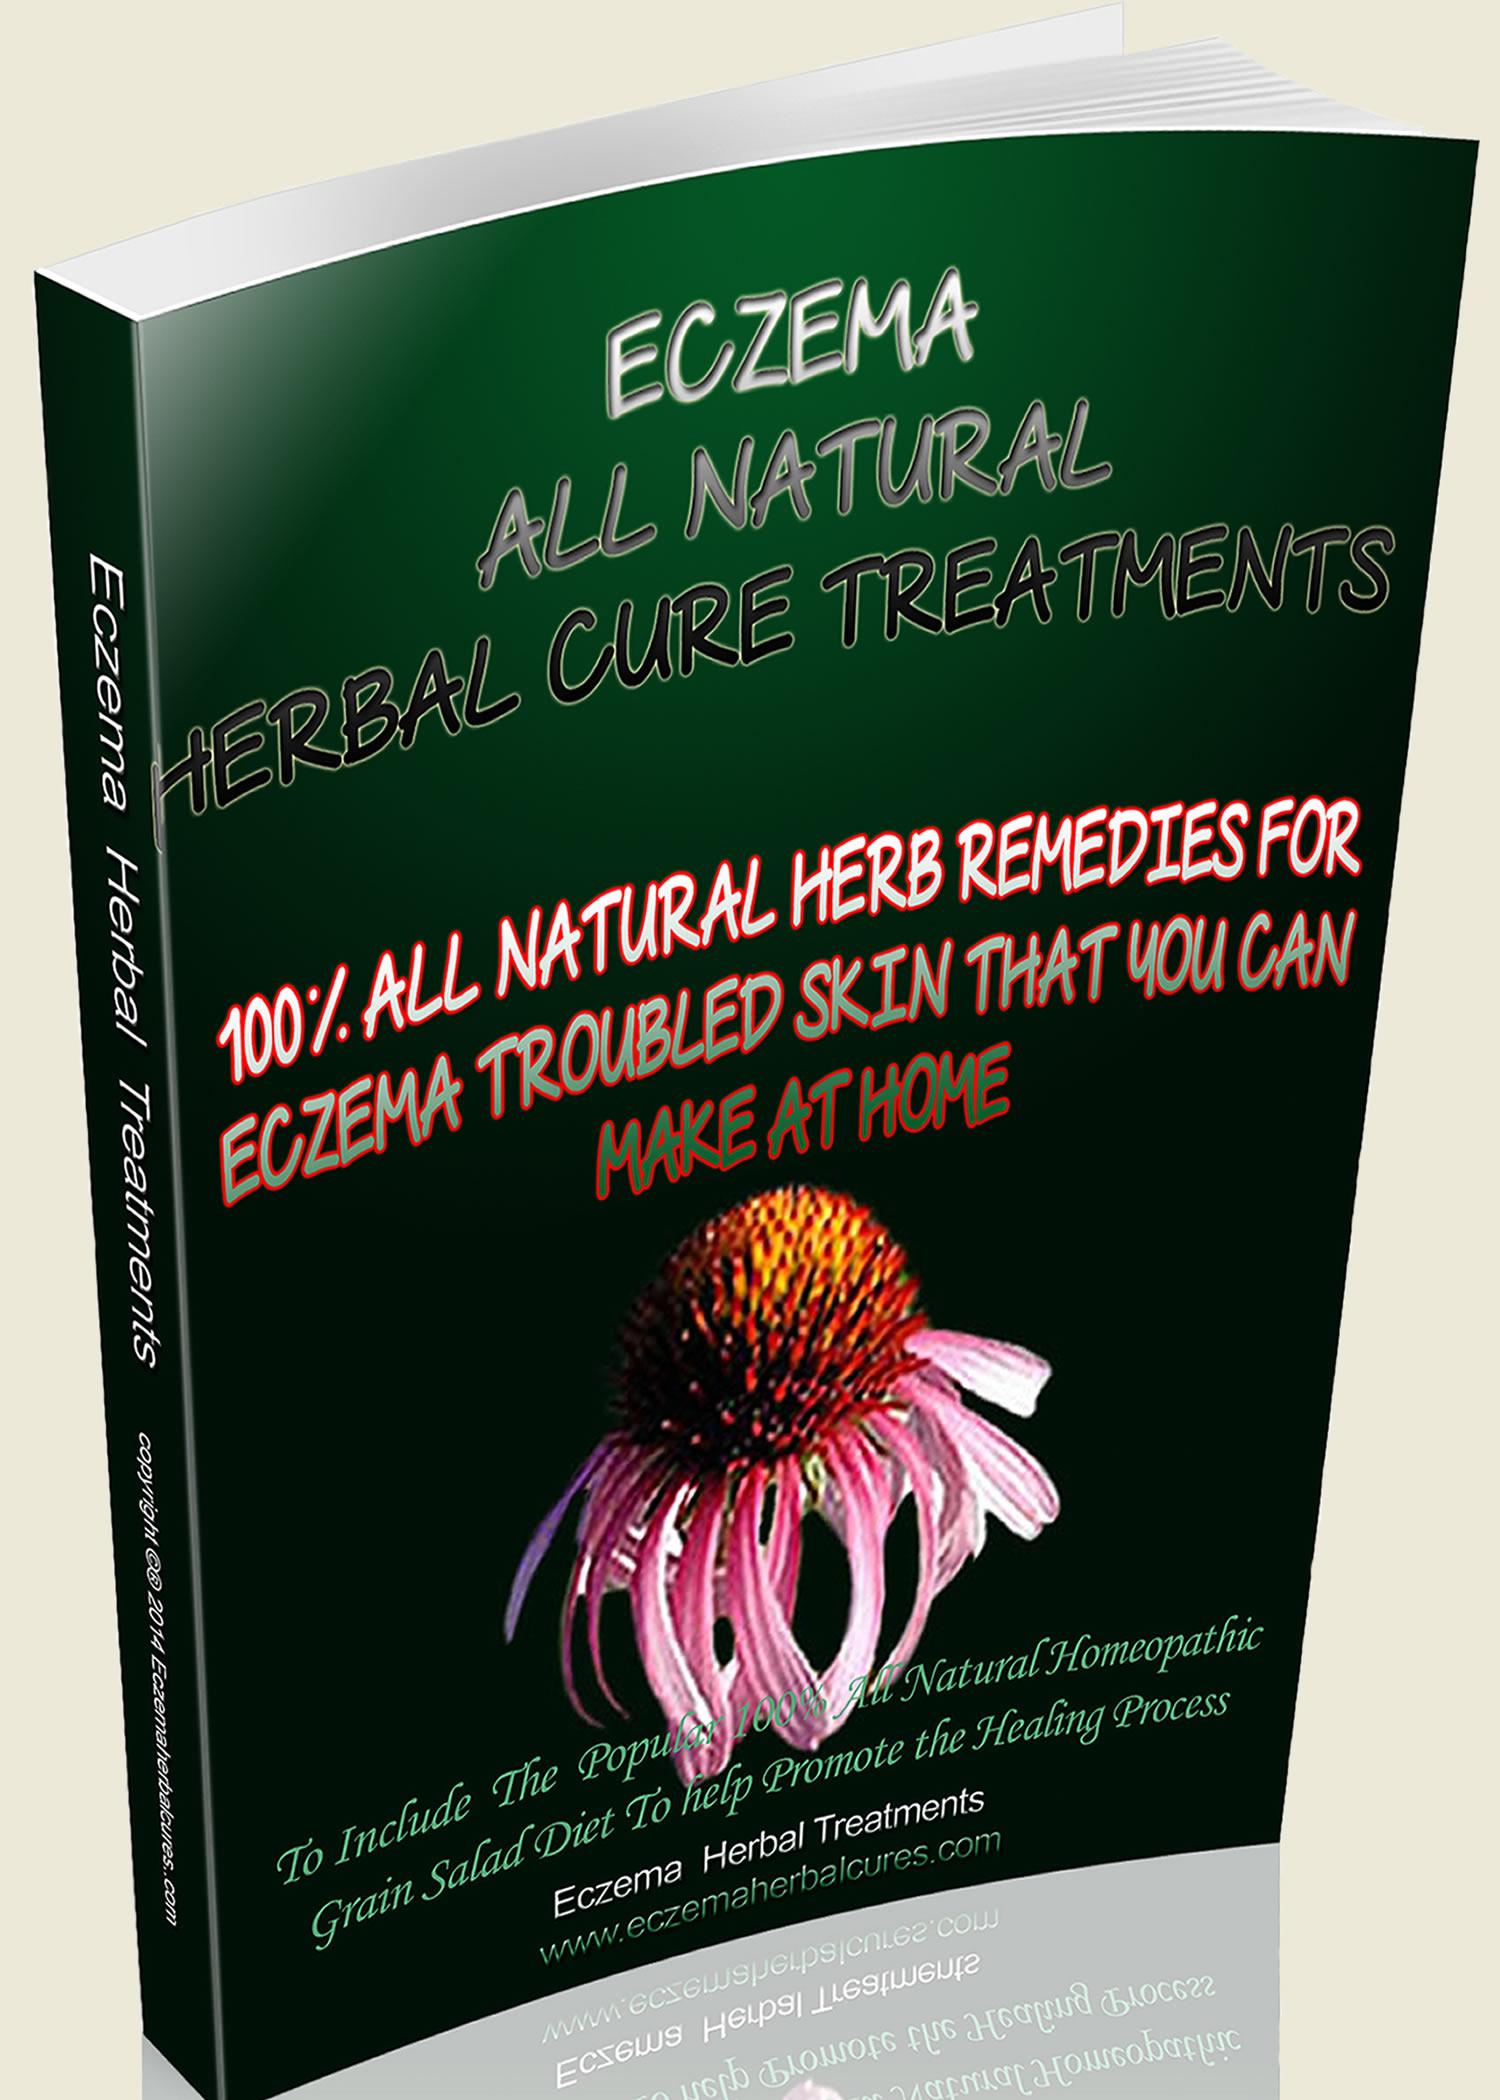 Whole Foods Market Eczema Treatments